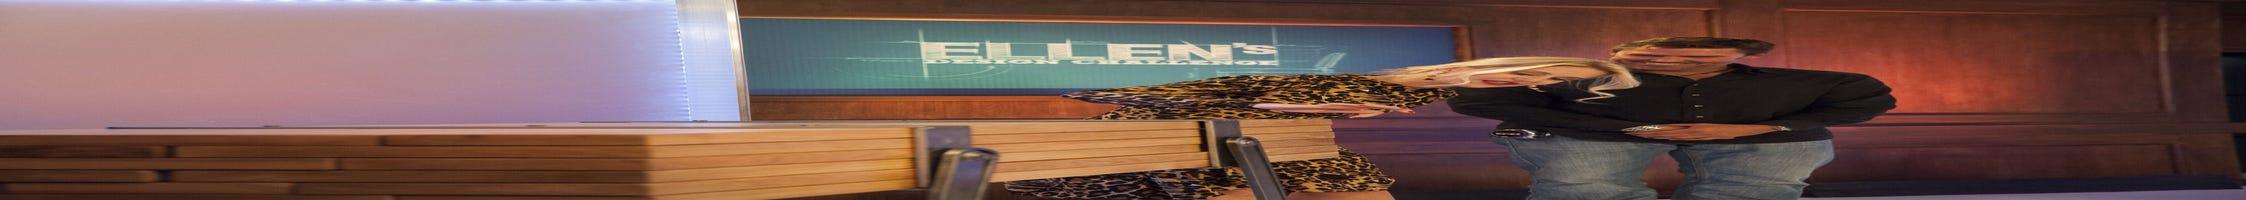 Disqualified 'Design Challenge' winner speaks on 'Ellen'